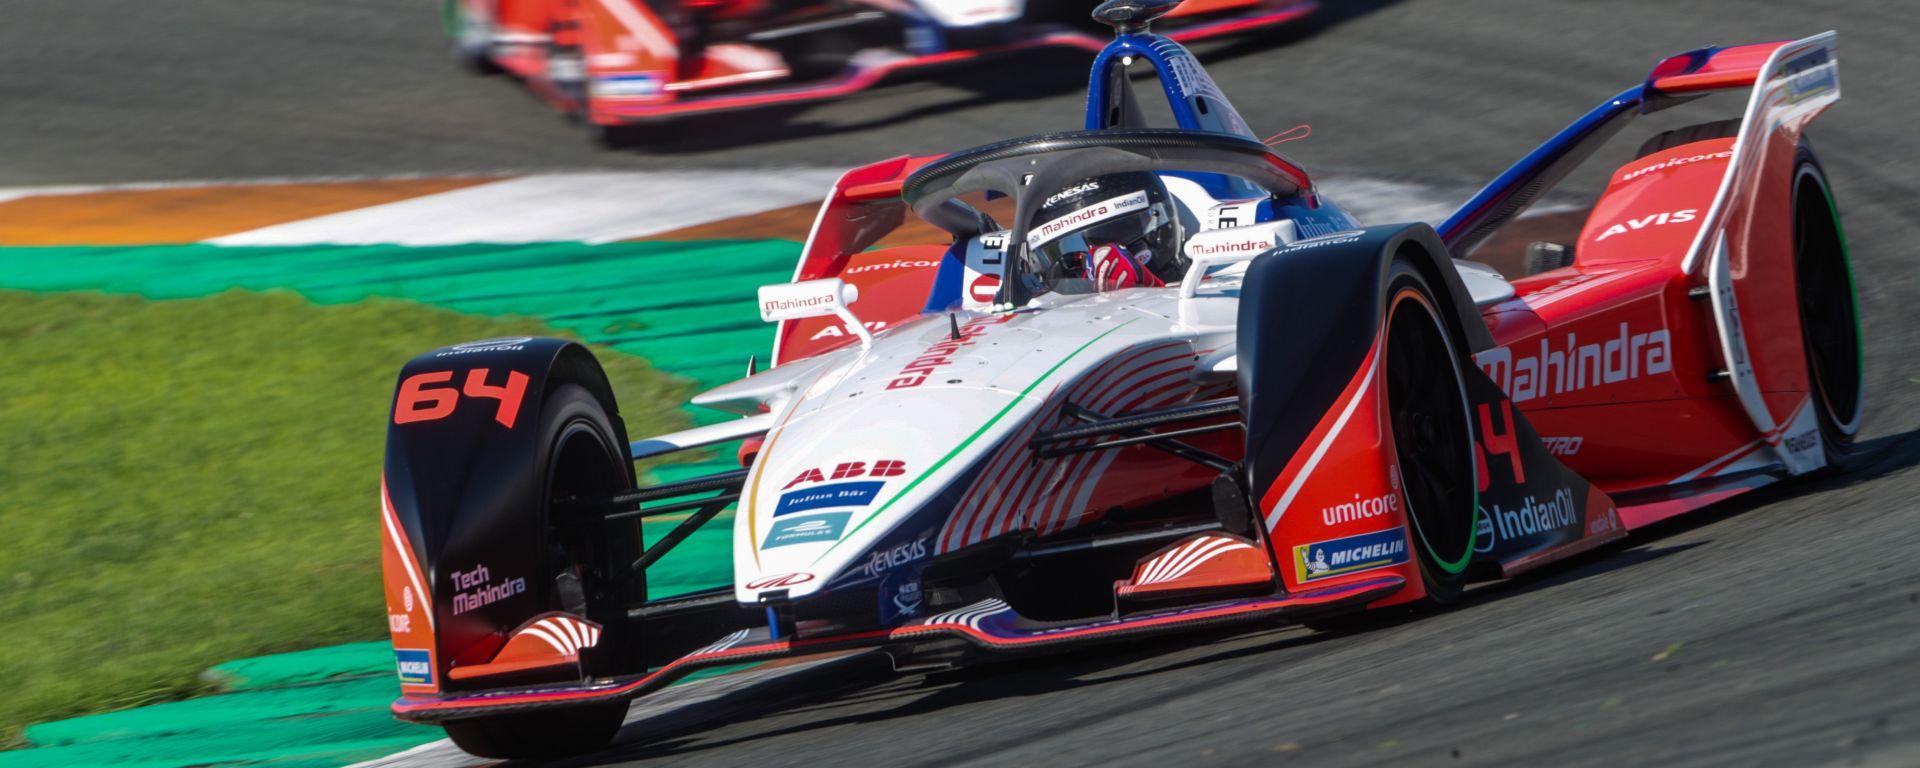 Formula E 2019: Mahindra Racing Team